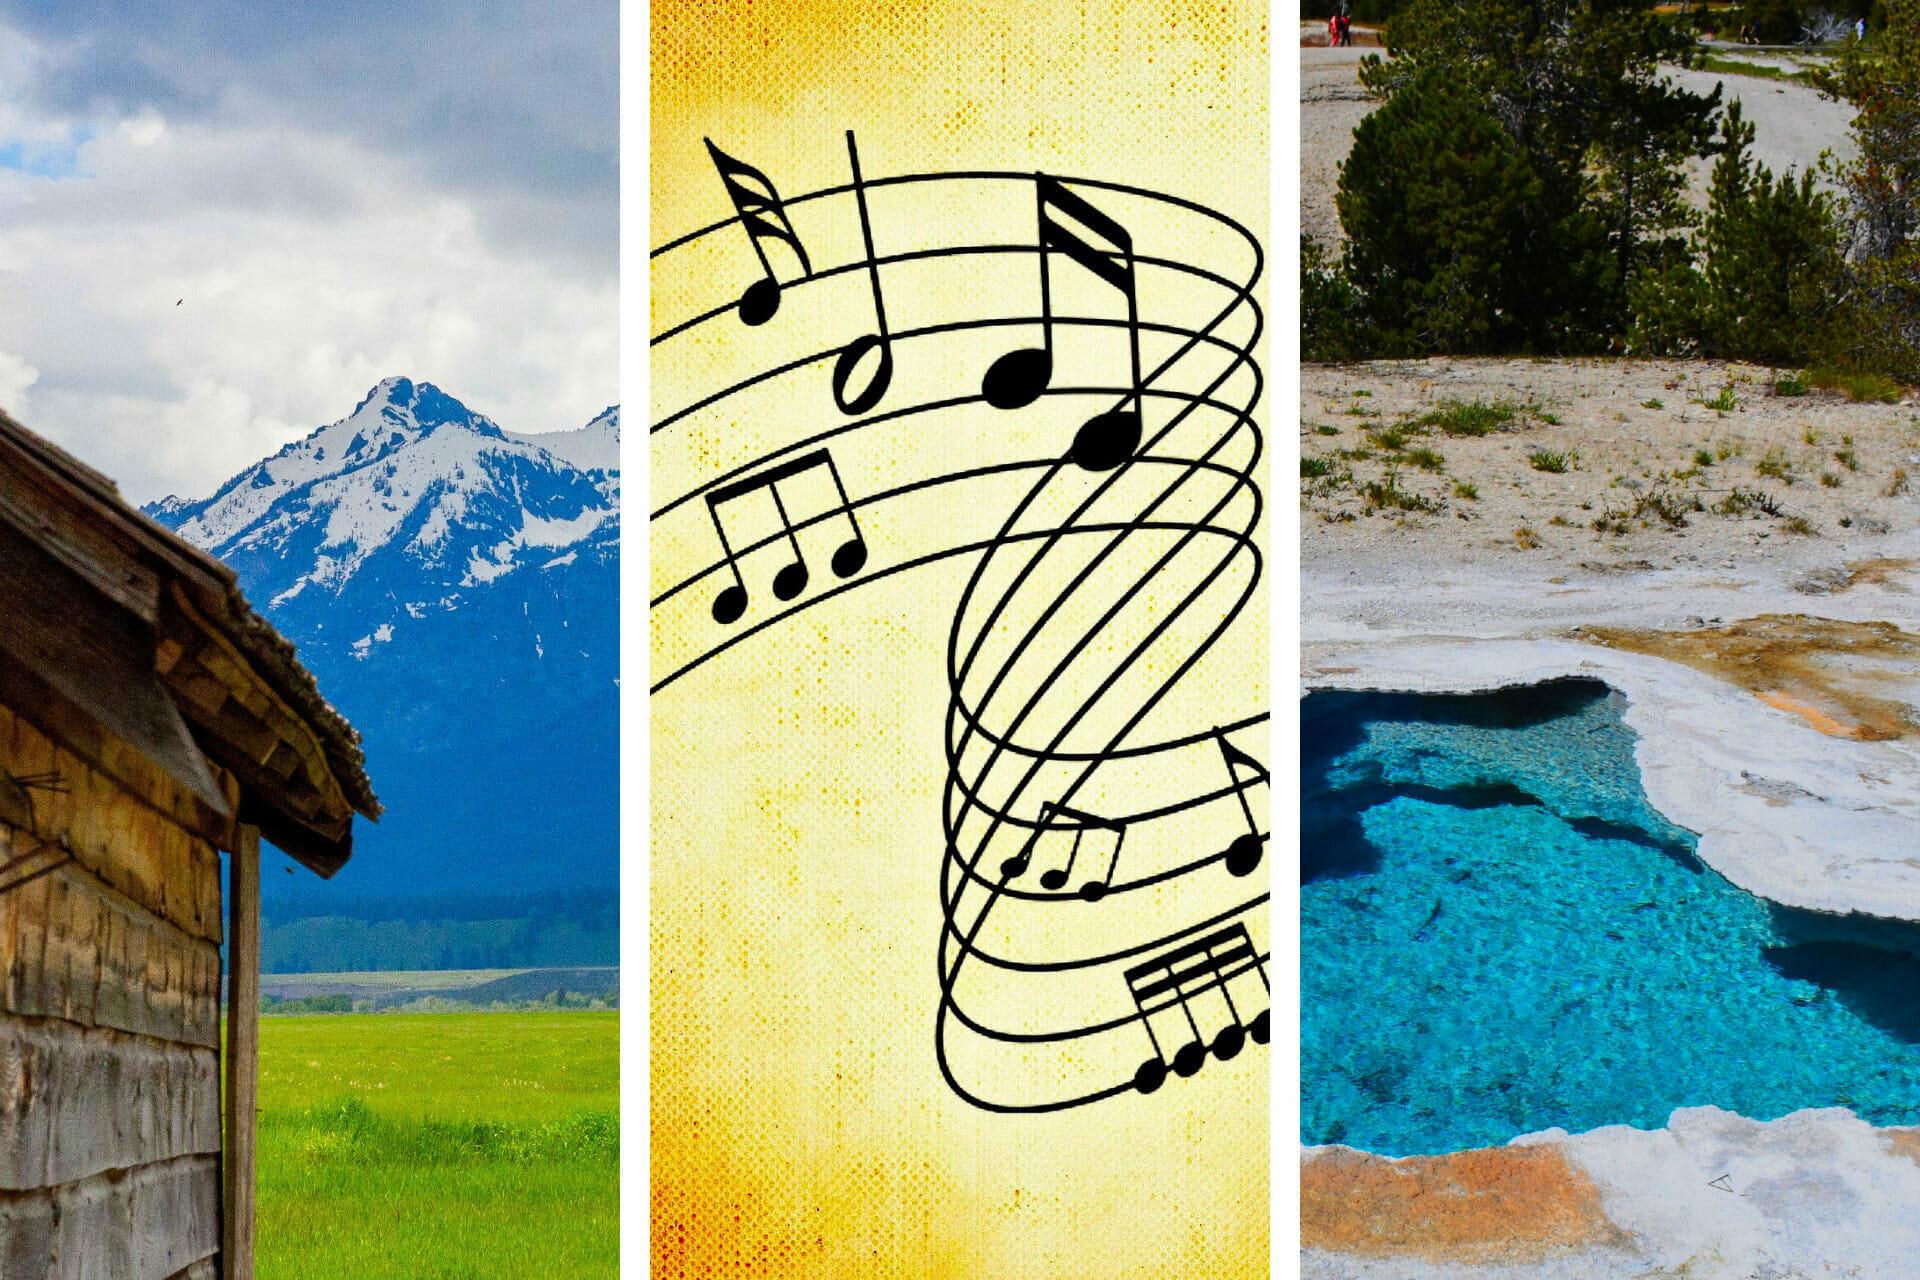 19+ Songs about Wyoming to Make You Nostalgic via @allamericanatlas